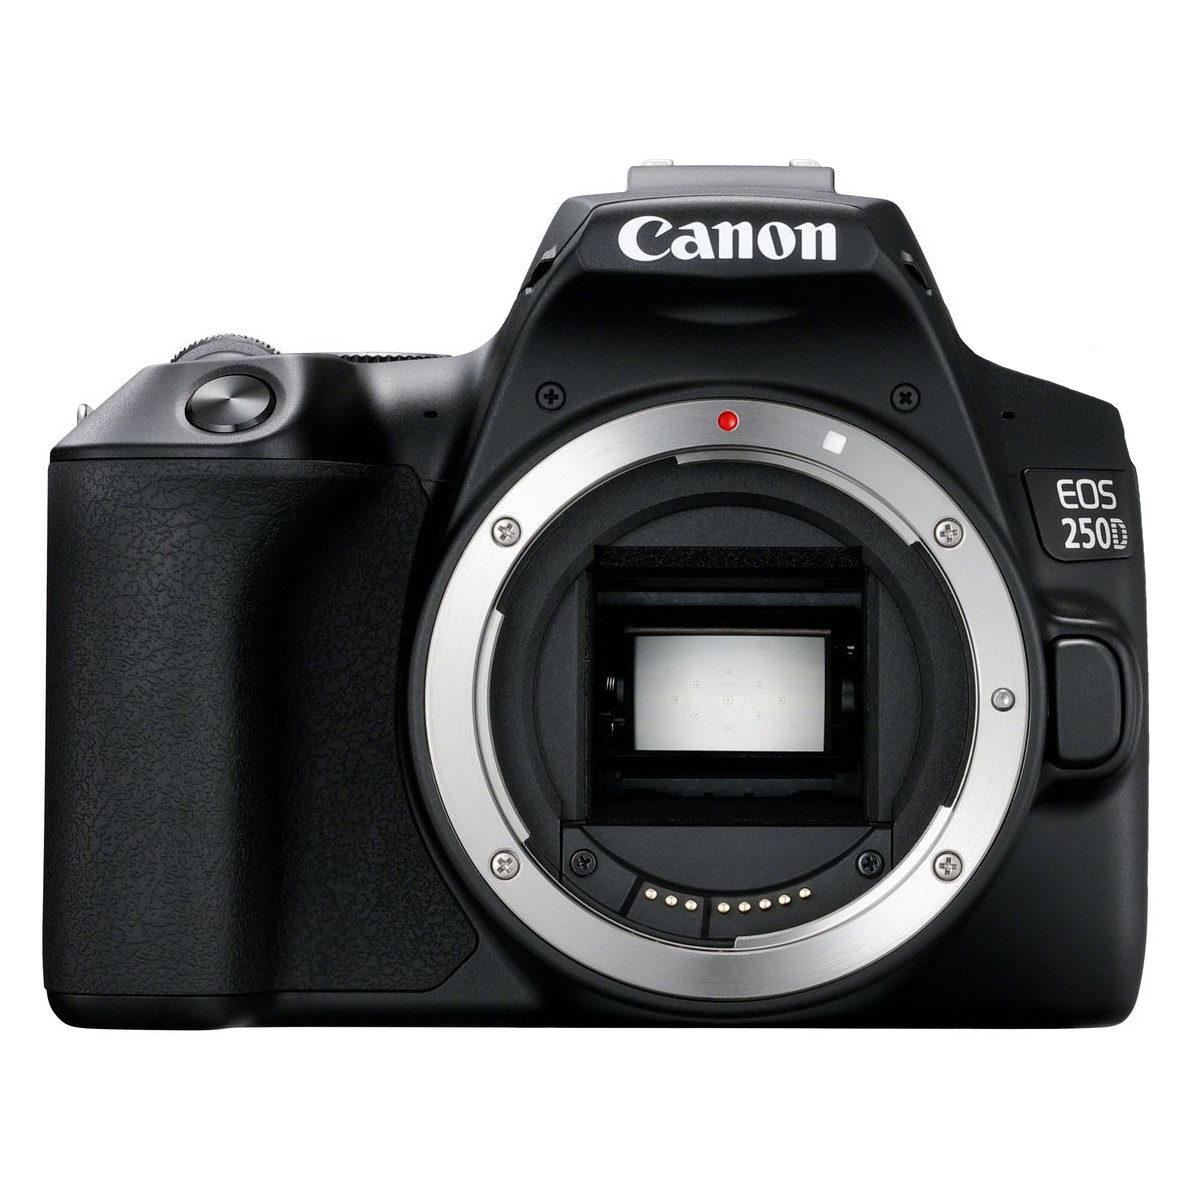 Canon EOS 250D DSLR Body Zwart <br/>€ 599.00 <br/> <a href='https://www.cameranu.nl/fotografie/?tt=12190_474631_241358_&r=https%3A%2F%2Fwww.cameranu.nl%2Fnl%2Fp2978195%2Fcanon-eos-250d-dslr-body-zwart%3Fchannable%3D002a596964003239373831393587%26utm_campaign%3D%26utm_content%3DEOS%2Bspiegelreflex%26utm_source%3DTradetracker%26utm_medium%3Dcpc%26utm_term%3DDigitale%2Bcamera%26apos%3Bs' target='_blank'>naar de winkel</a>